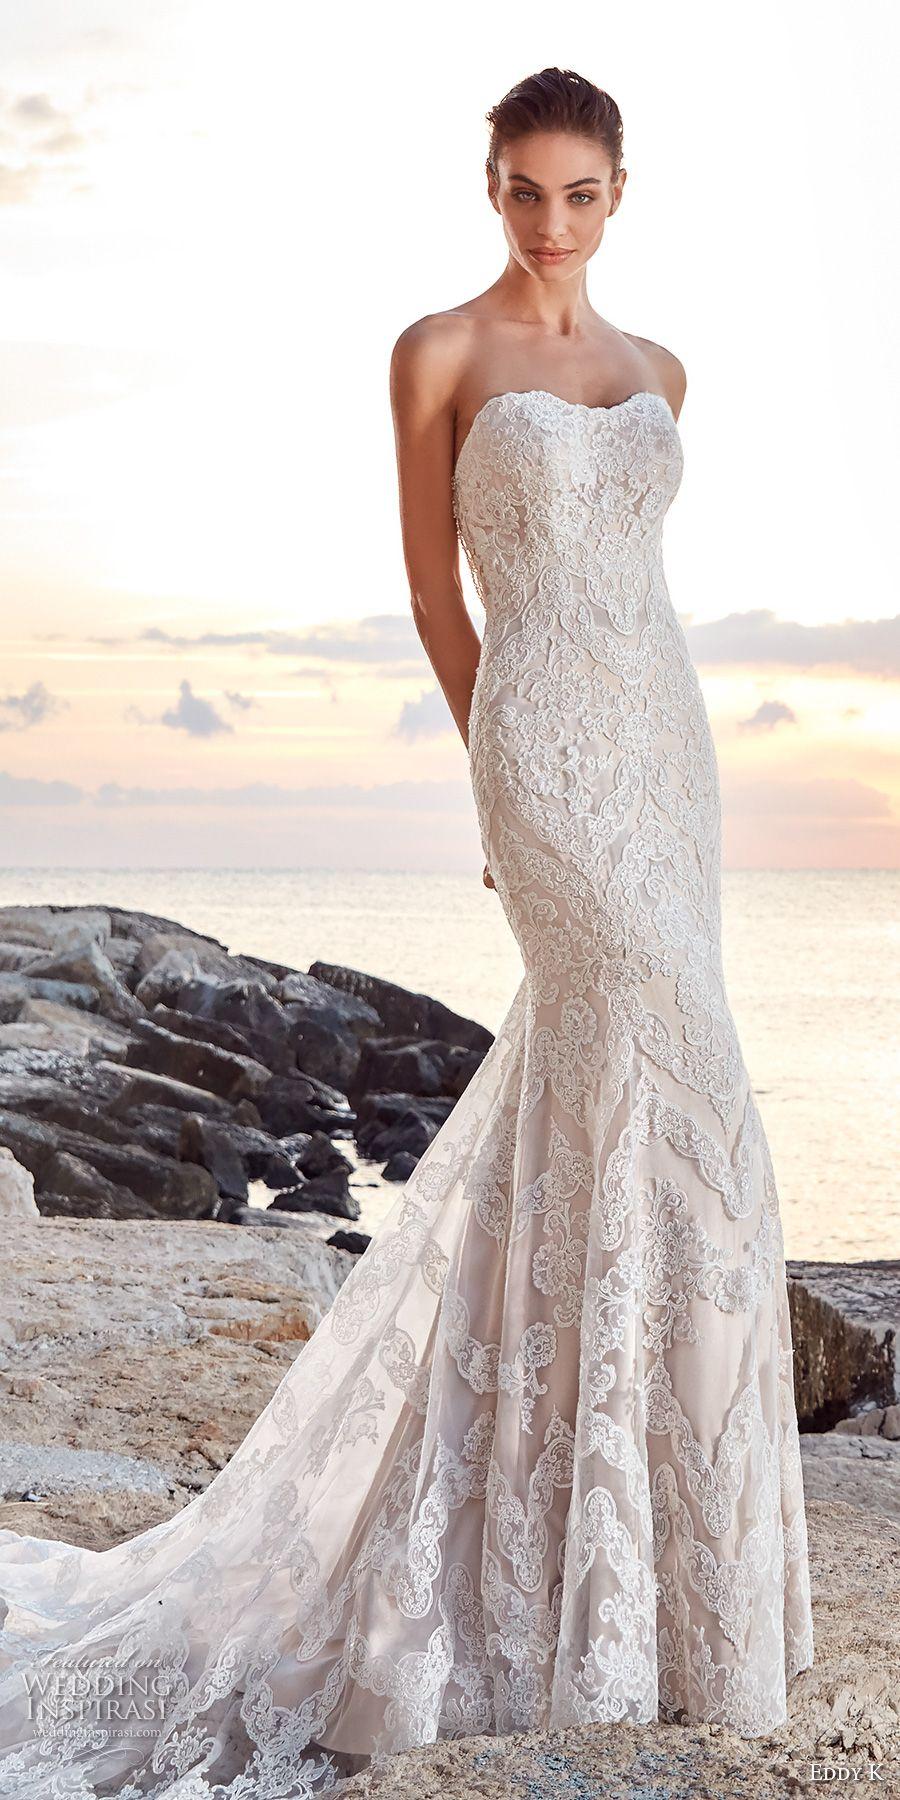 Best wedding dress styles 2018 summer